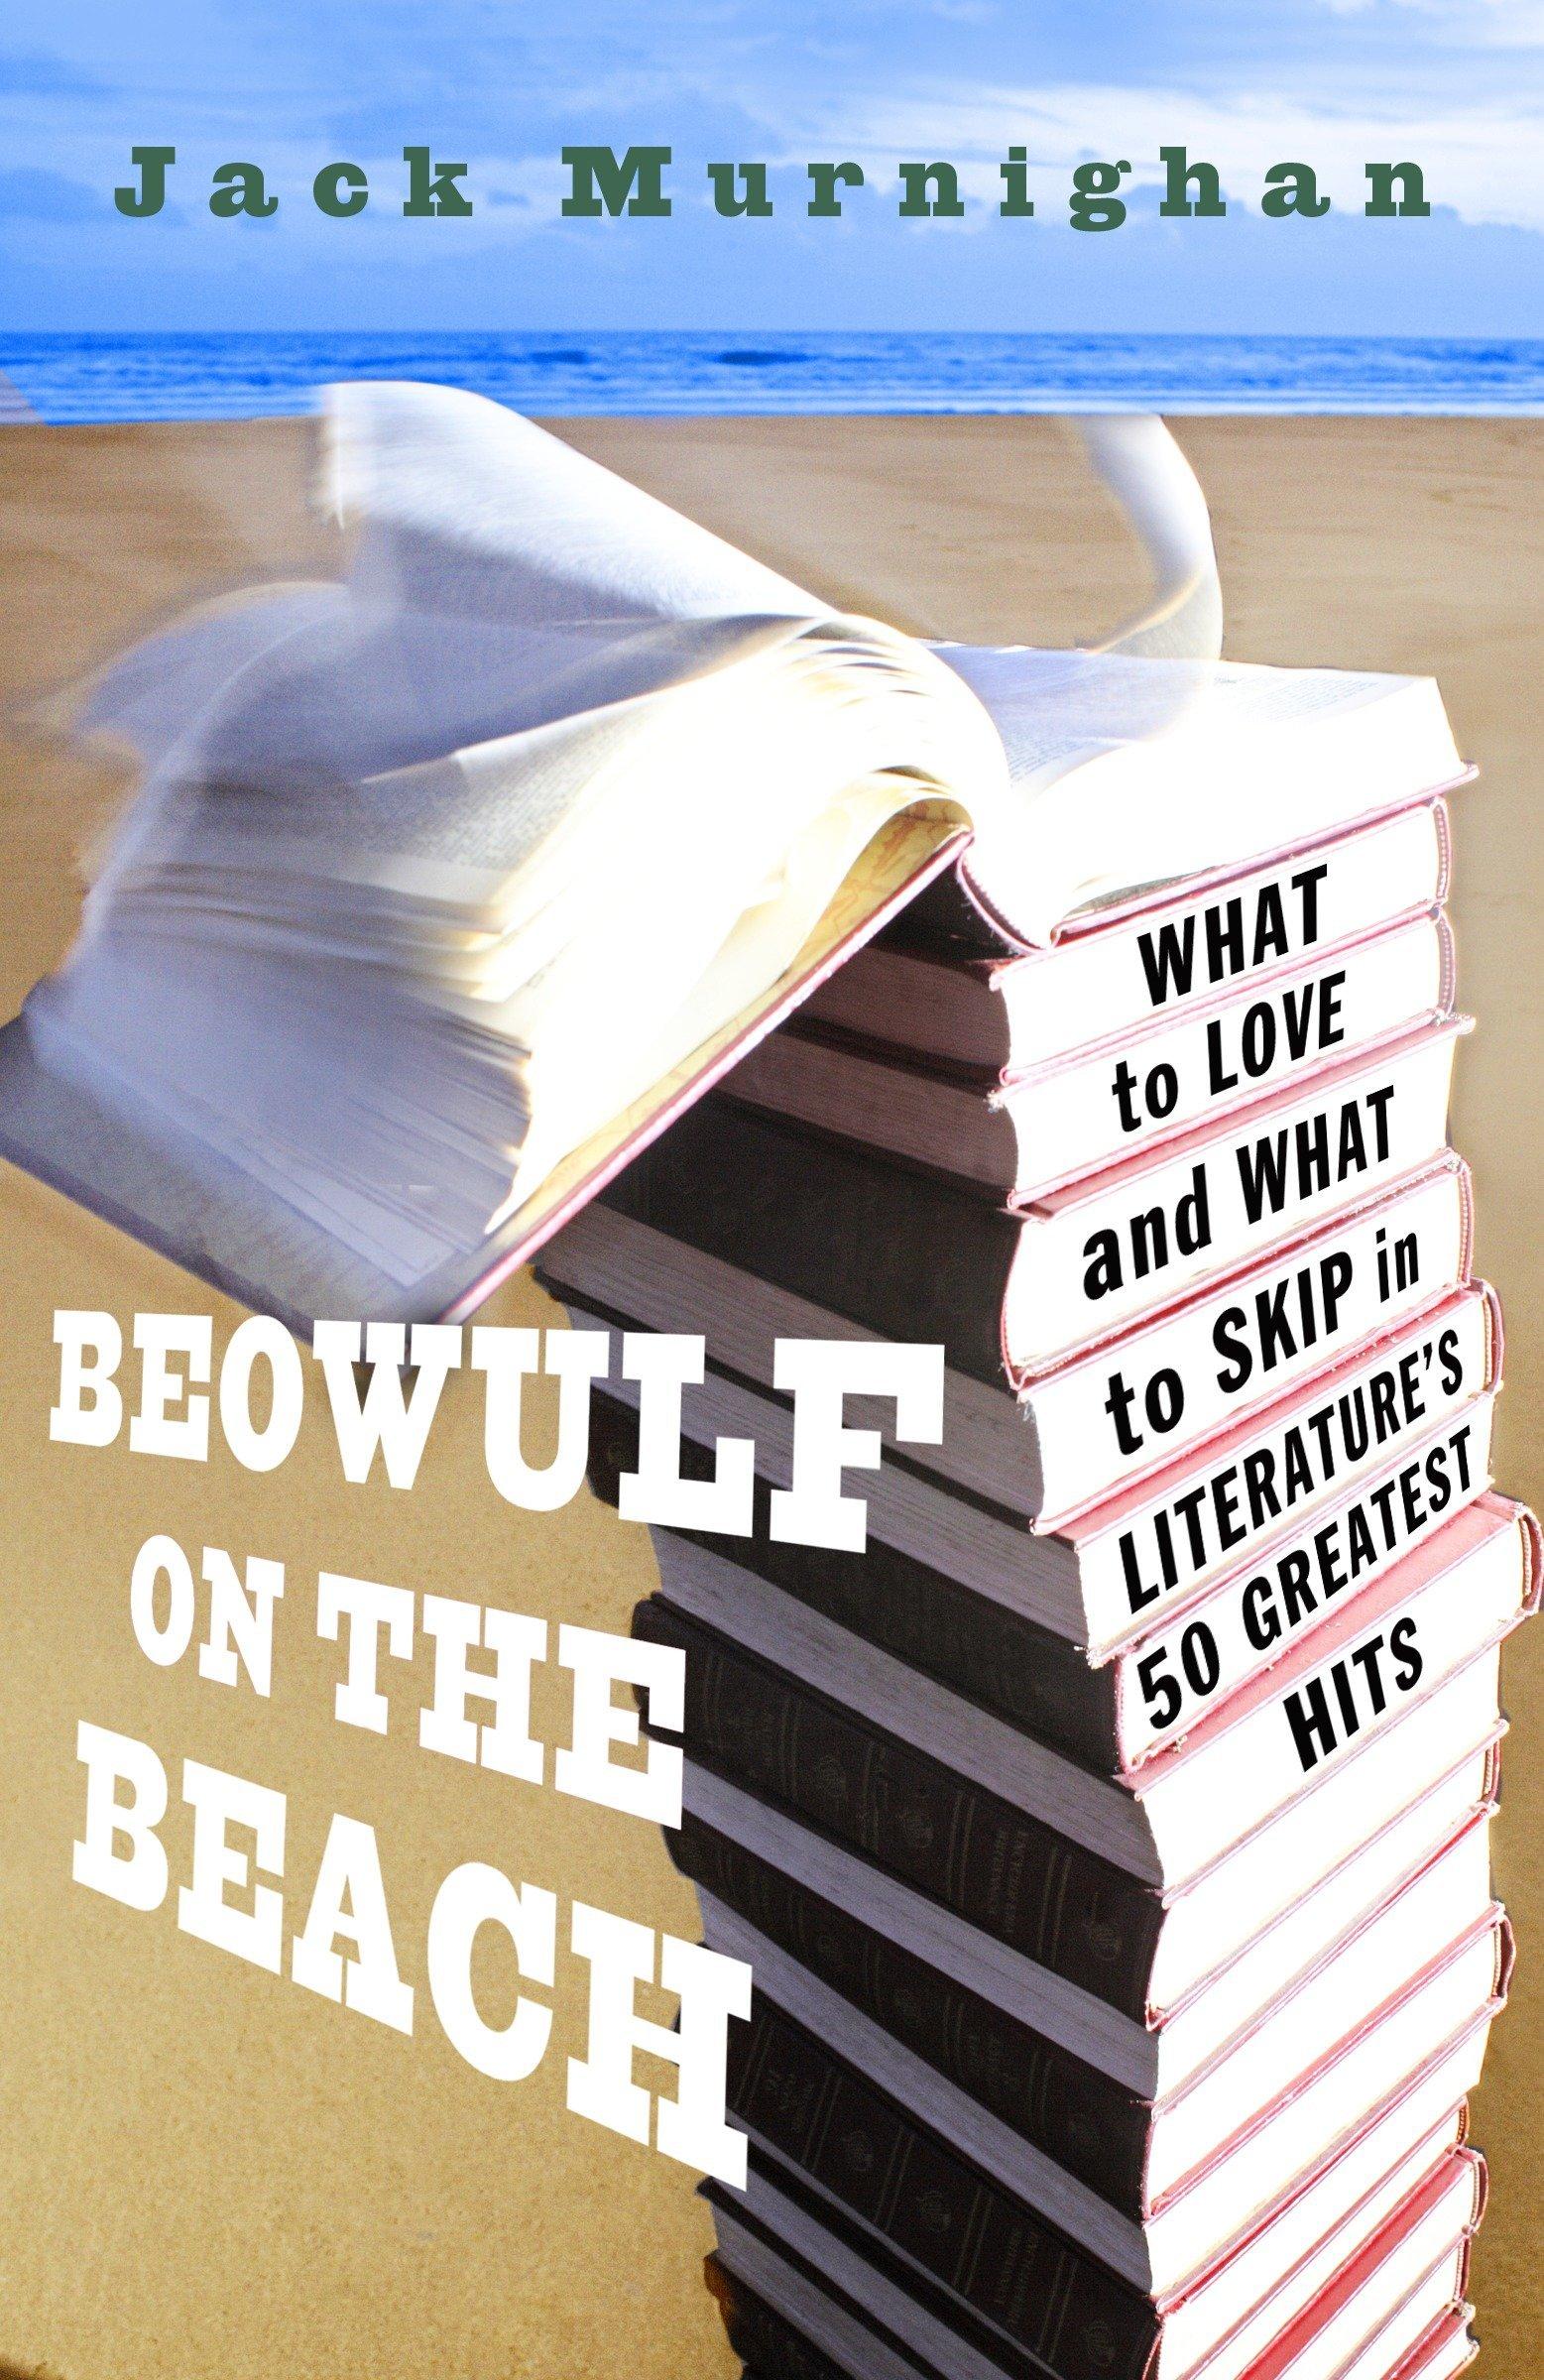 beowulf on the beach murnighan jack